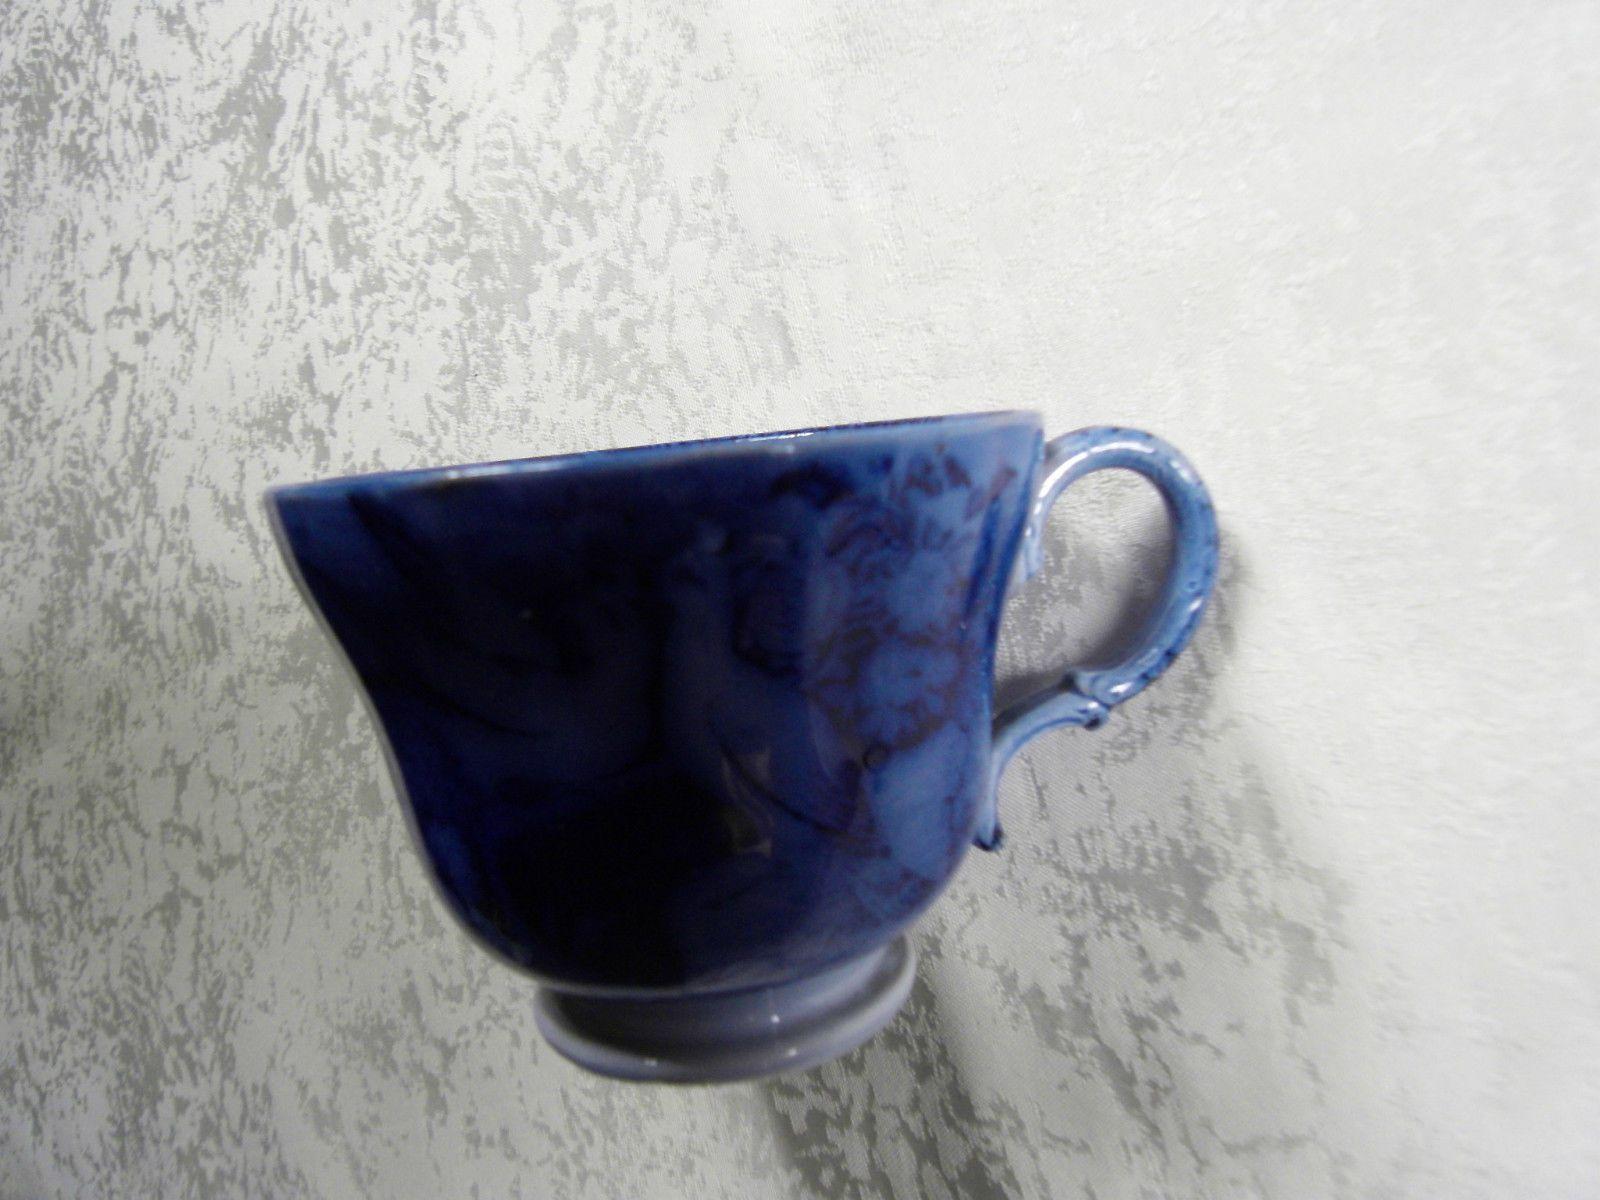 e1991d0a7d014dcb5d84c873ff162064 Luxus Villeroy Und Boch Keramik Dekorationen